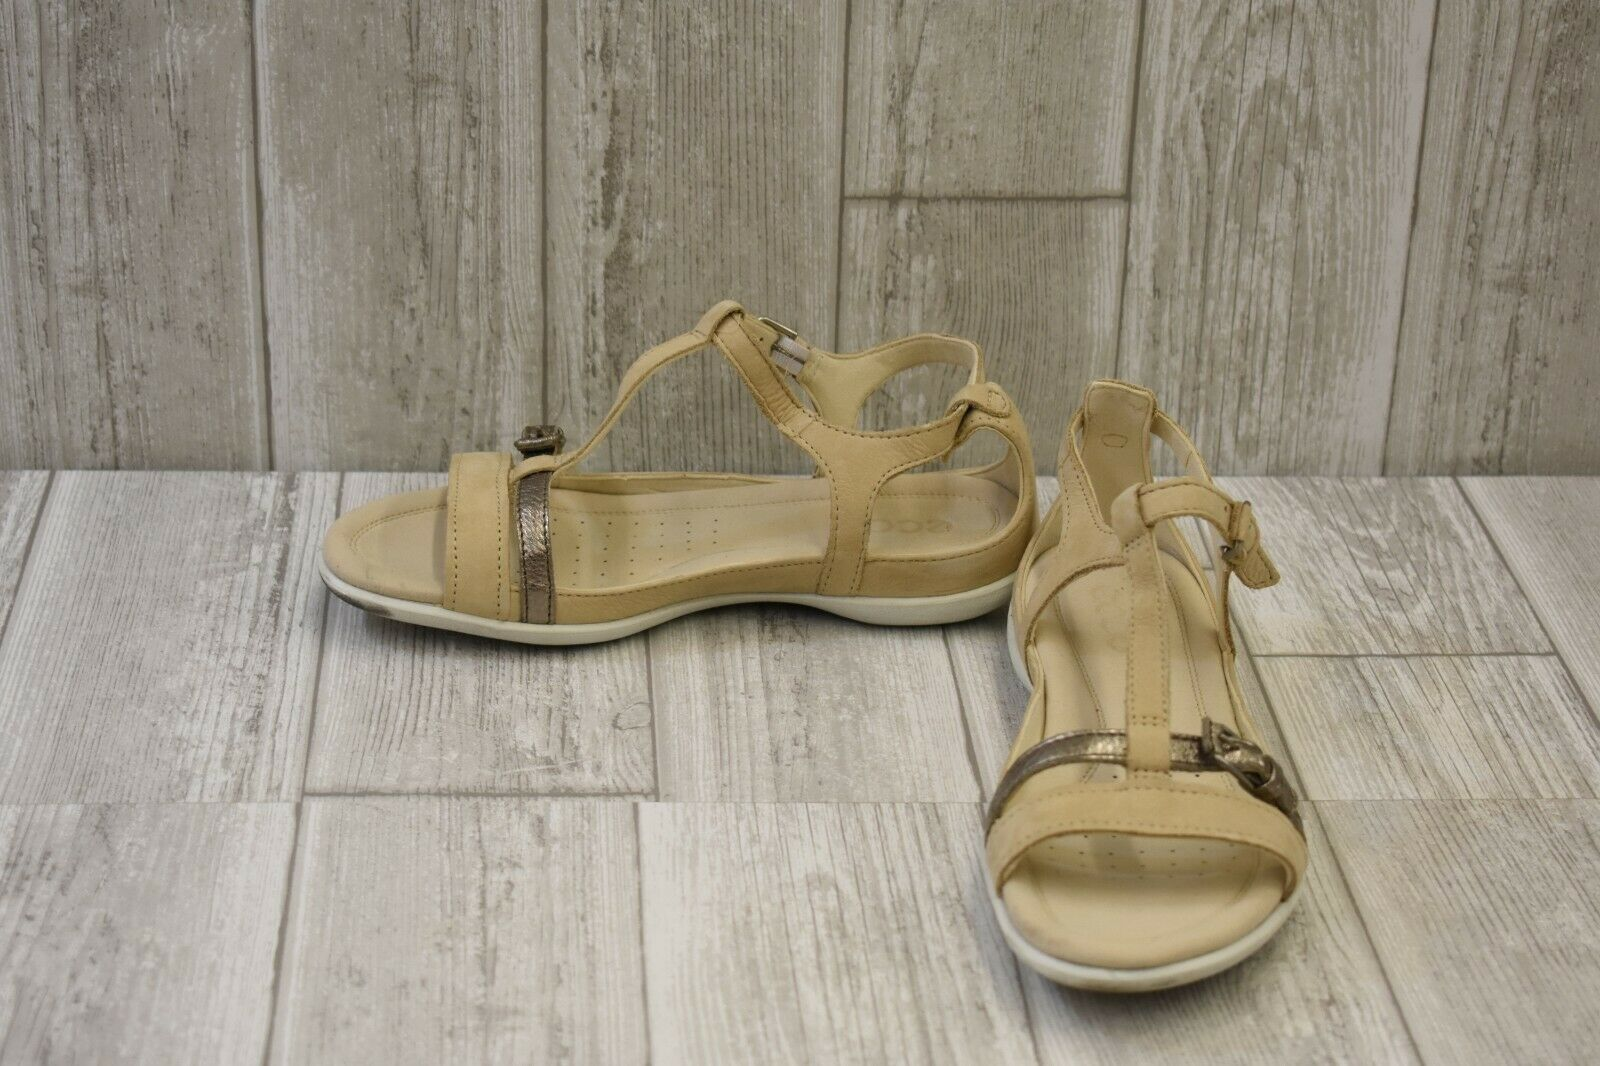 ECCO Flash Buckle Leather Flat Sandals, Women's Size 6-6.5, Powder Warm Grey